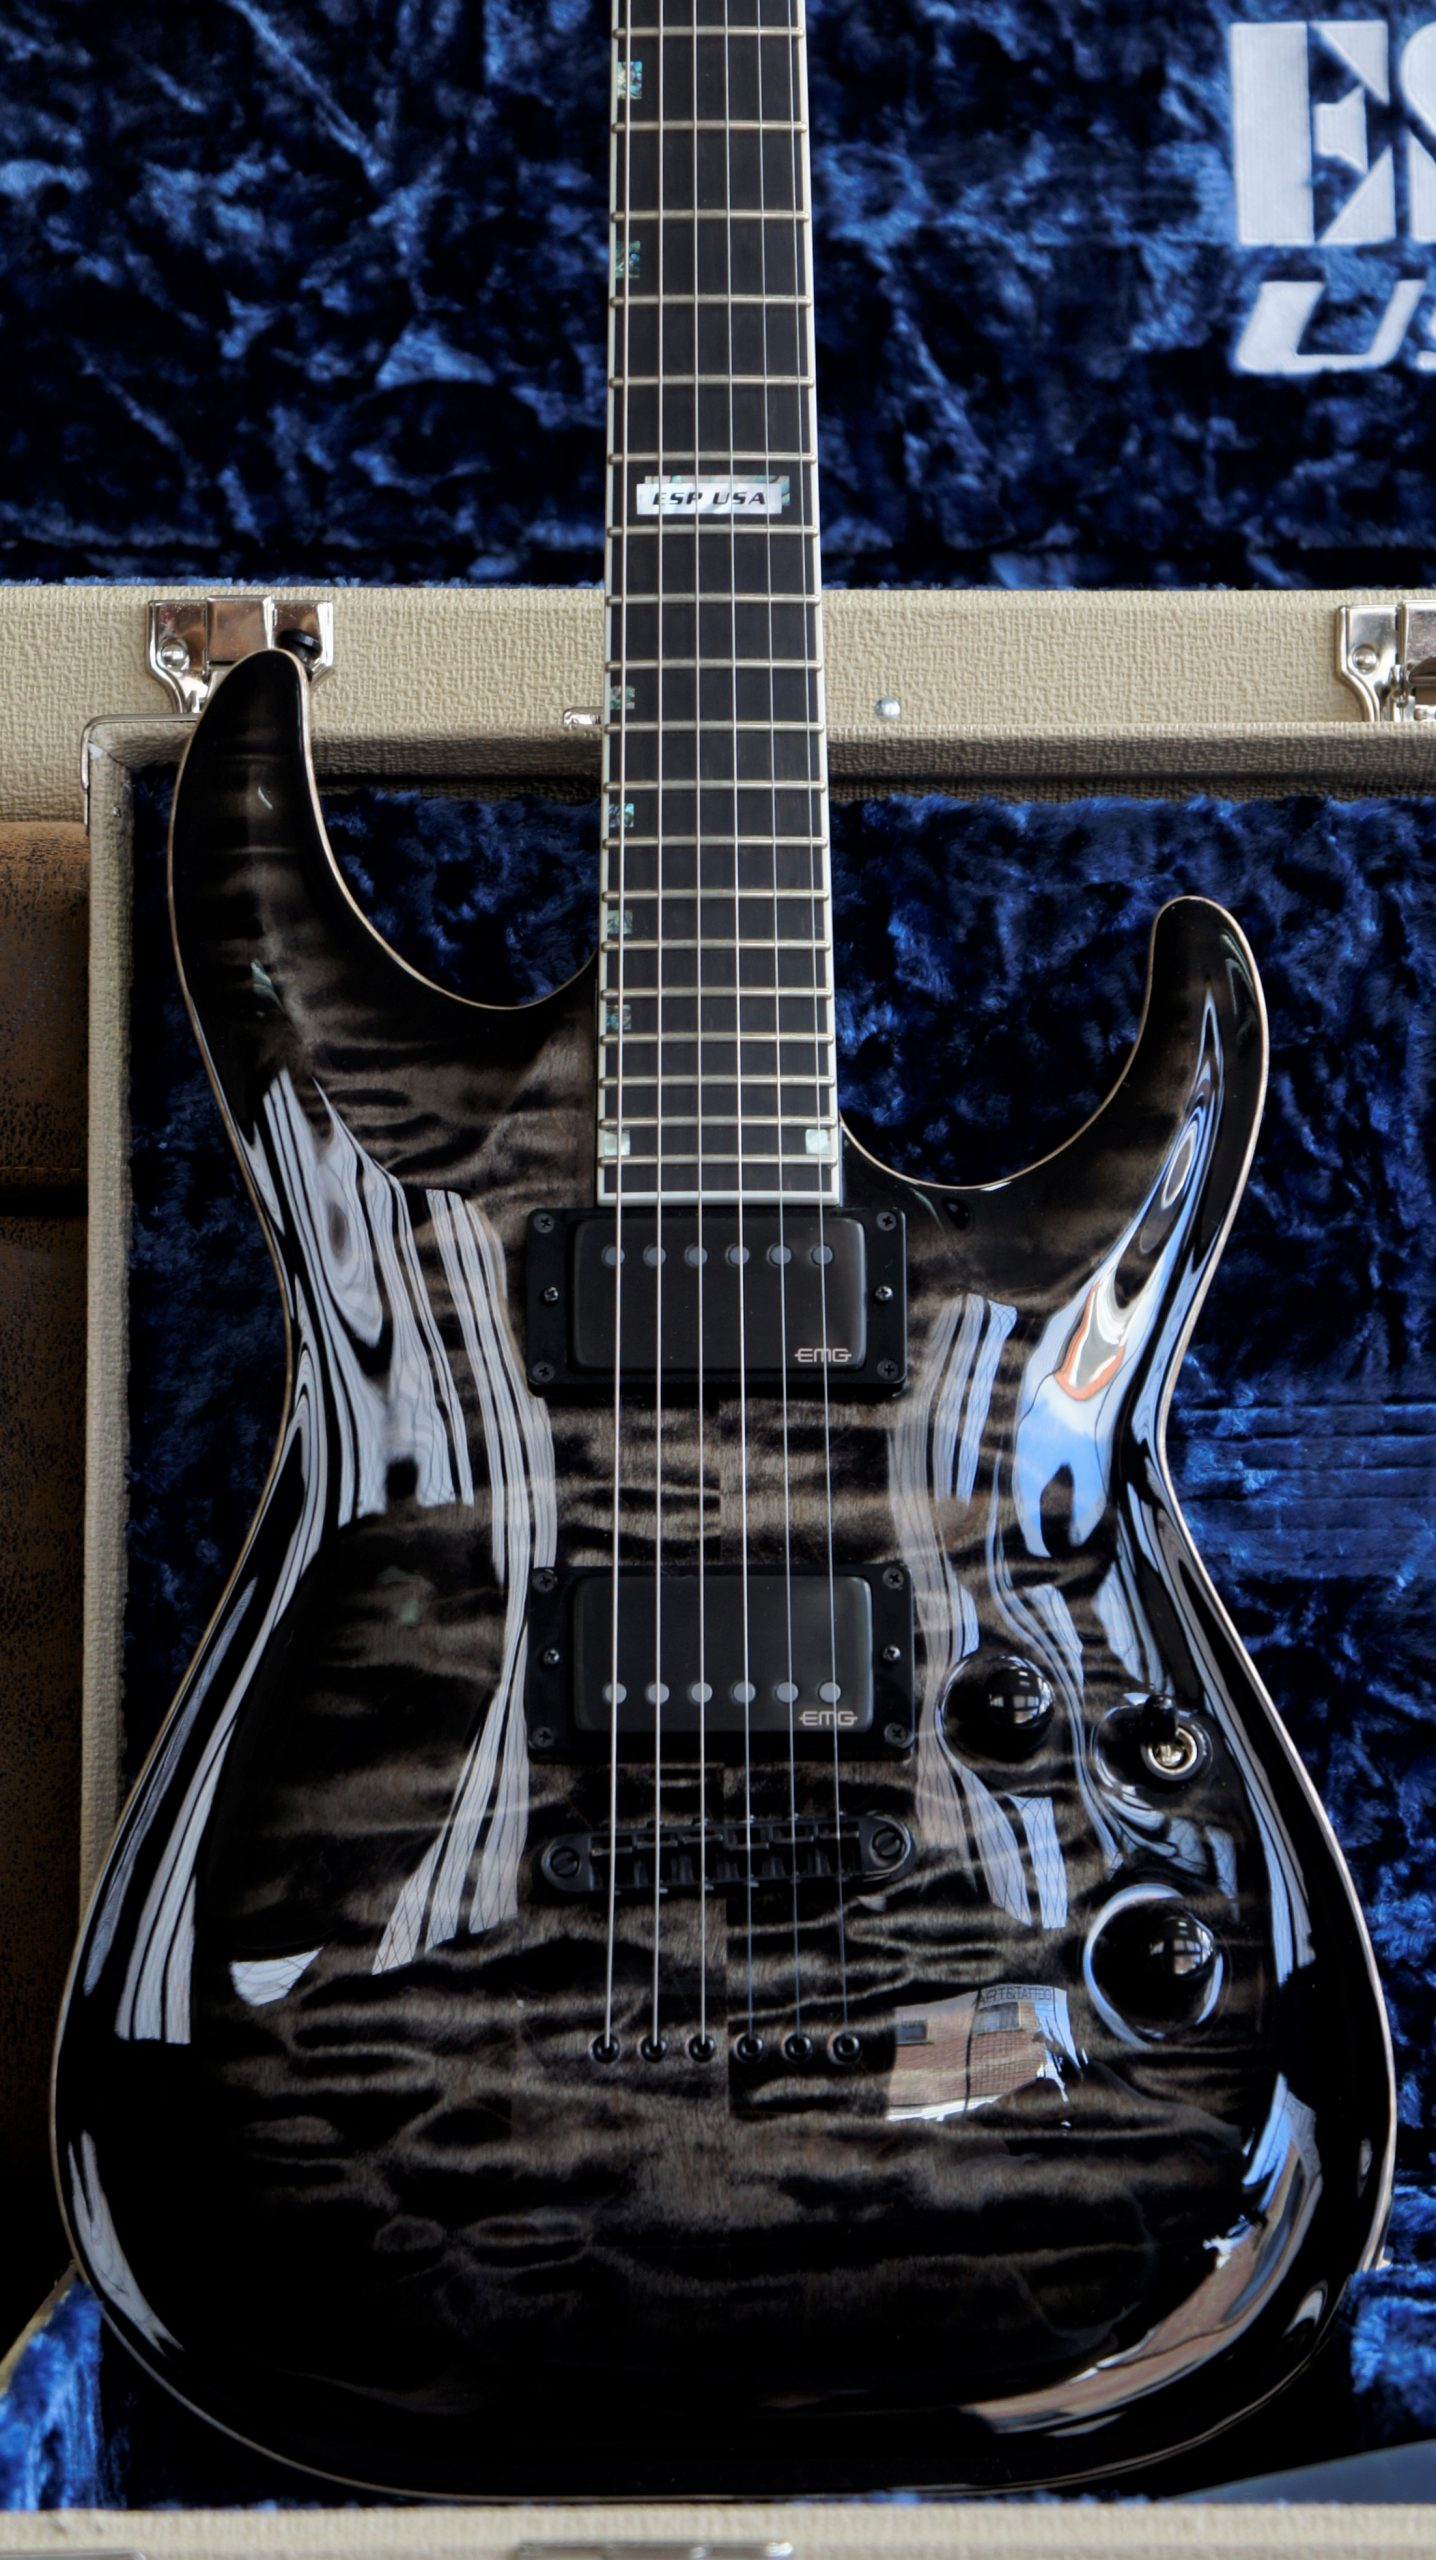 ESP USA Horizon II STBLKSB - See-Thru Black Sunburst